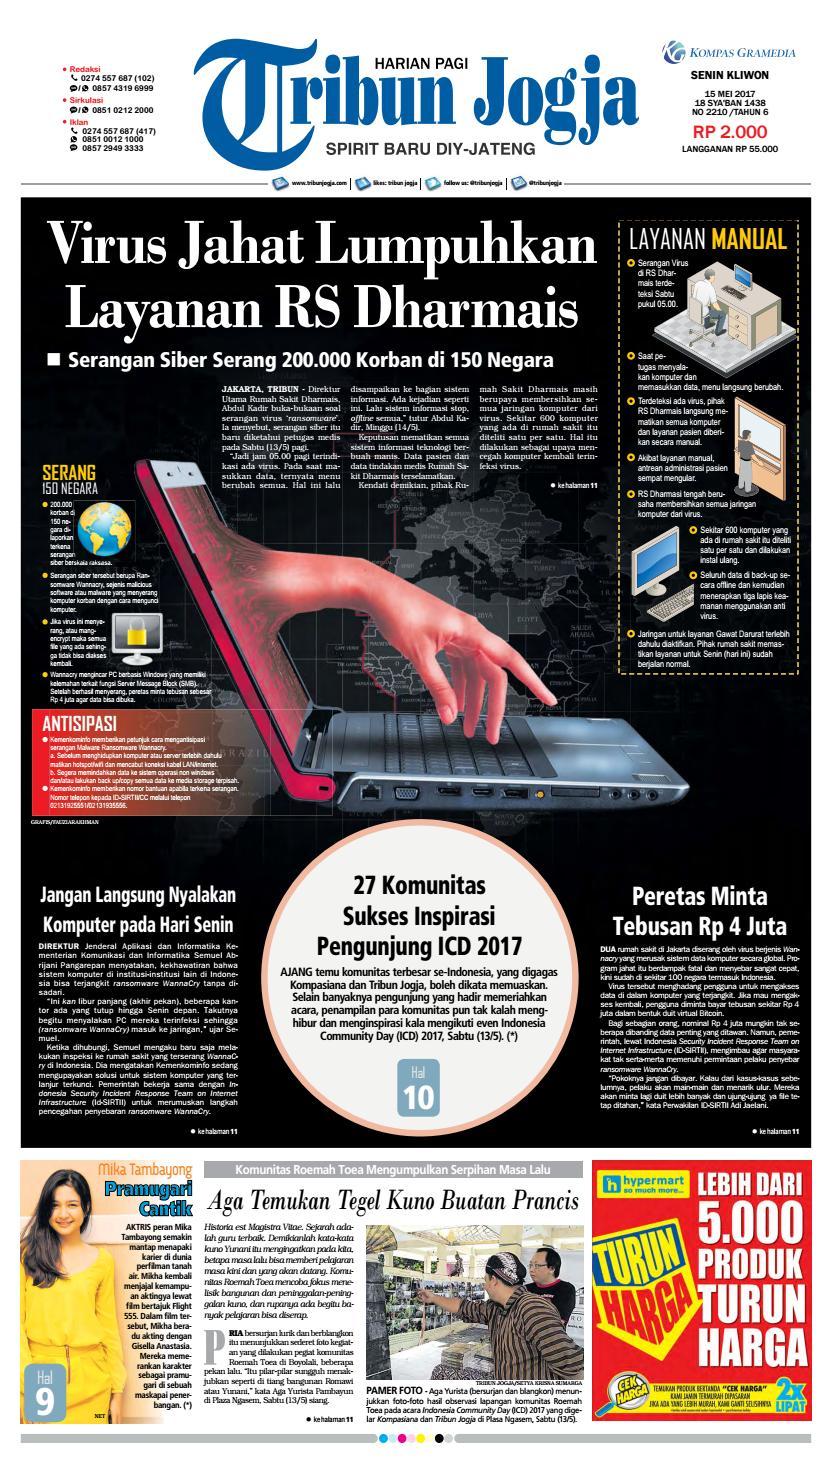 Tribunjogja 15 05 2017 By Tribun Jogja Issuu Loop Hardiknas Voucher Indomaret Rp 200000